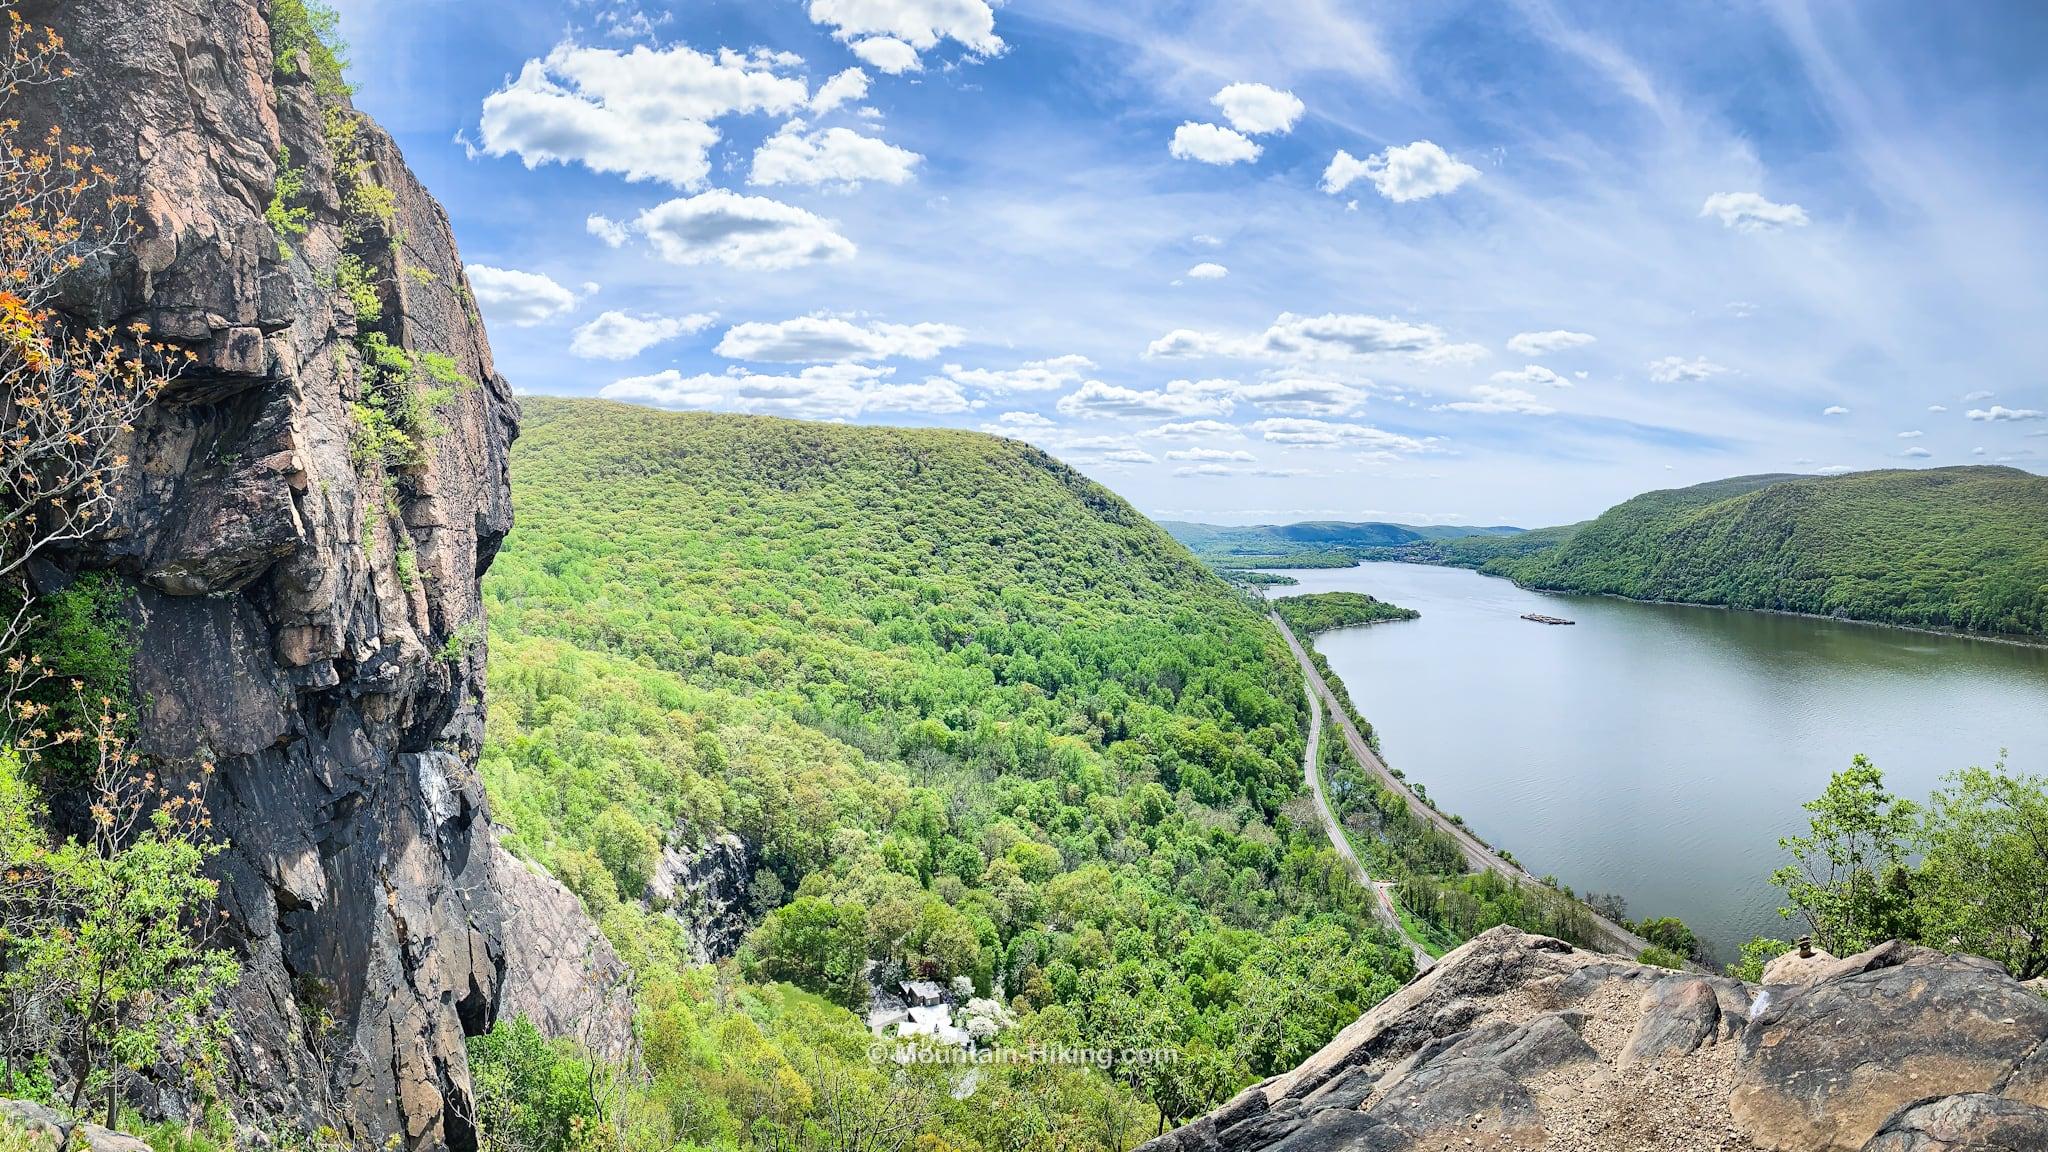 view south down the Hudson